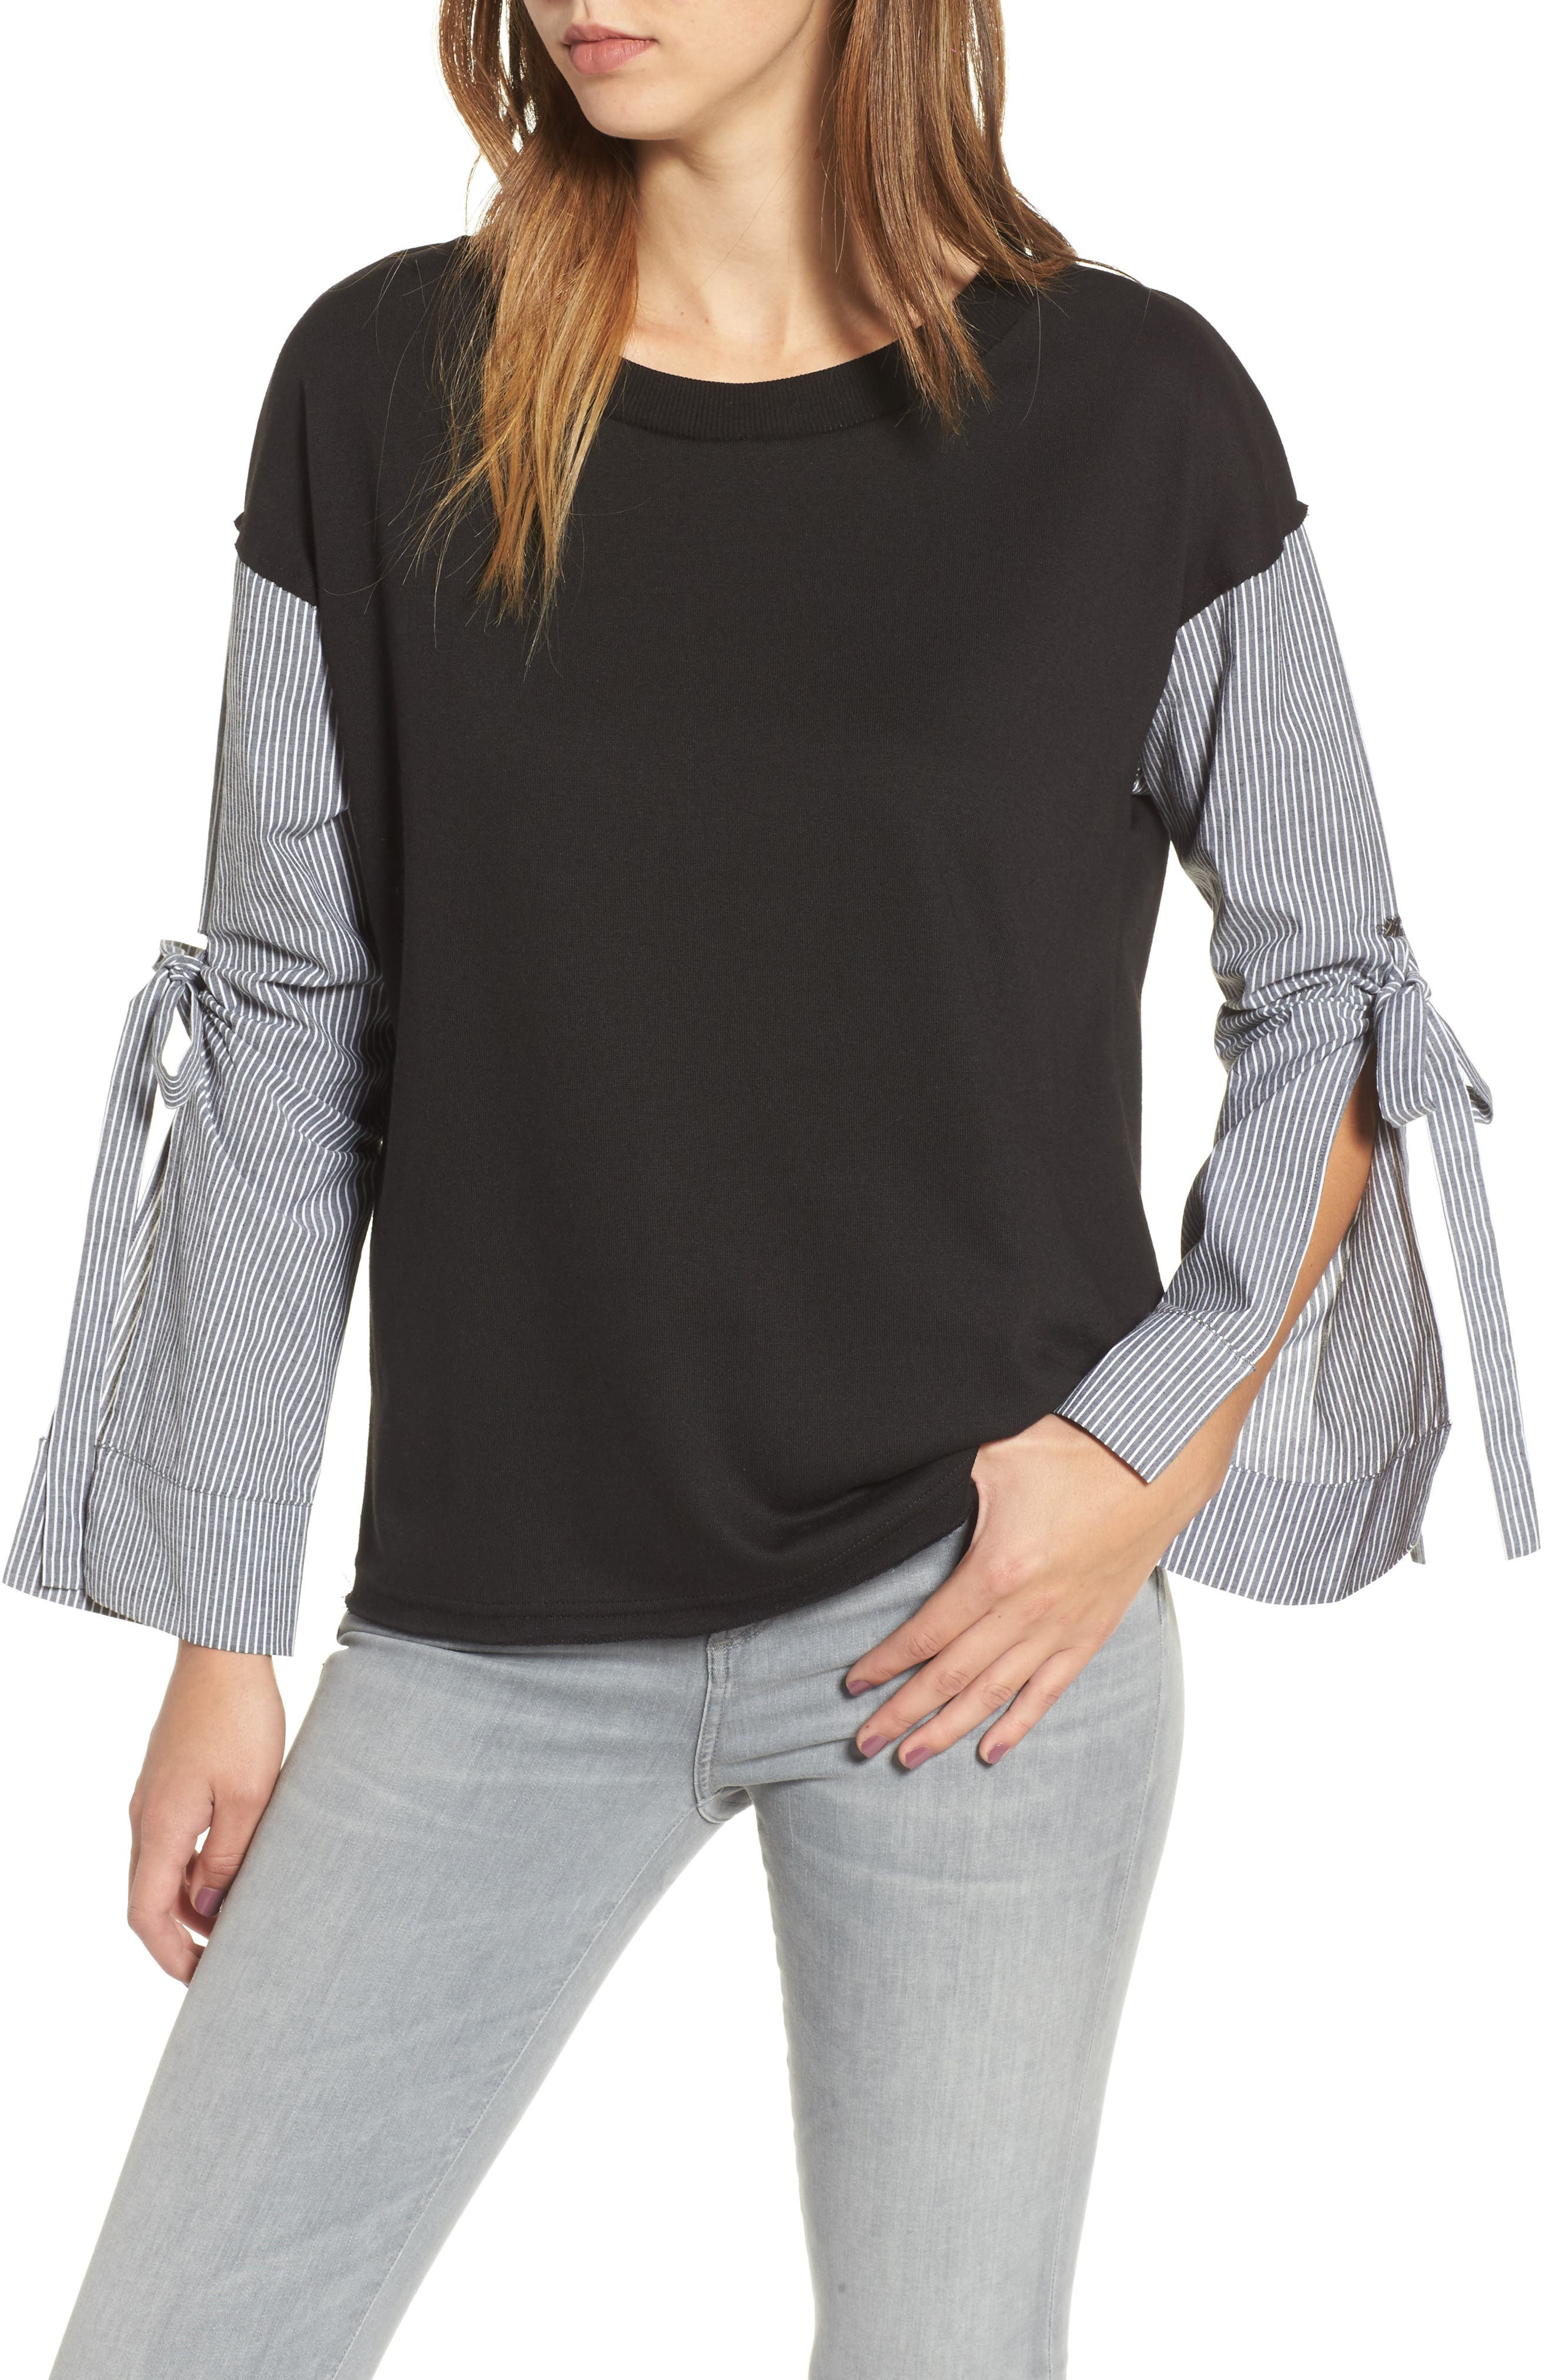 Socialite Tie Sleeve Sweatshirt